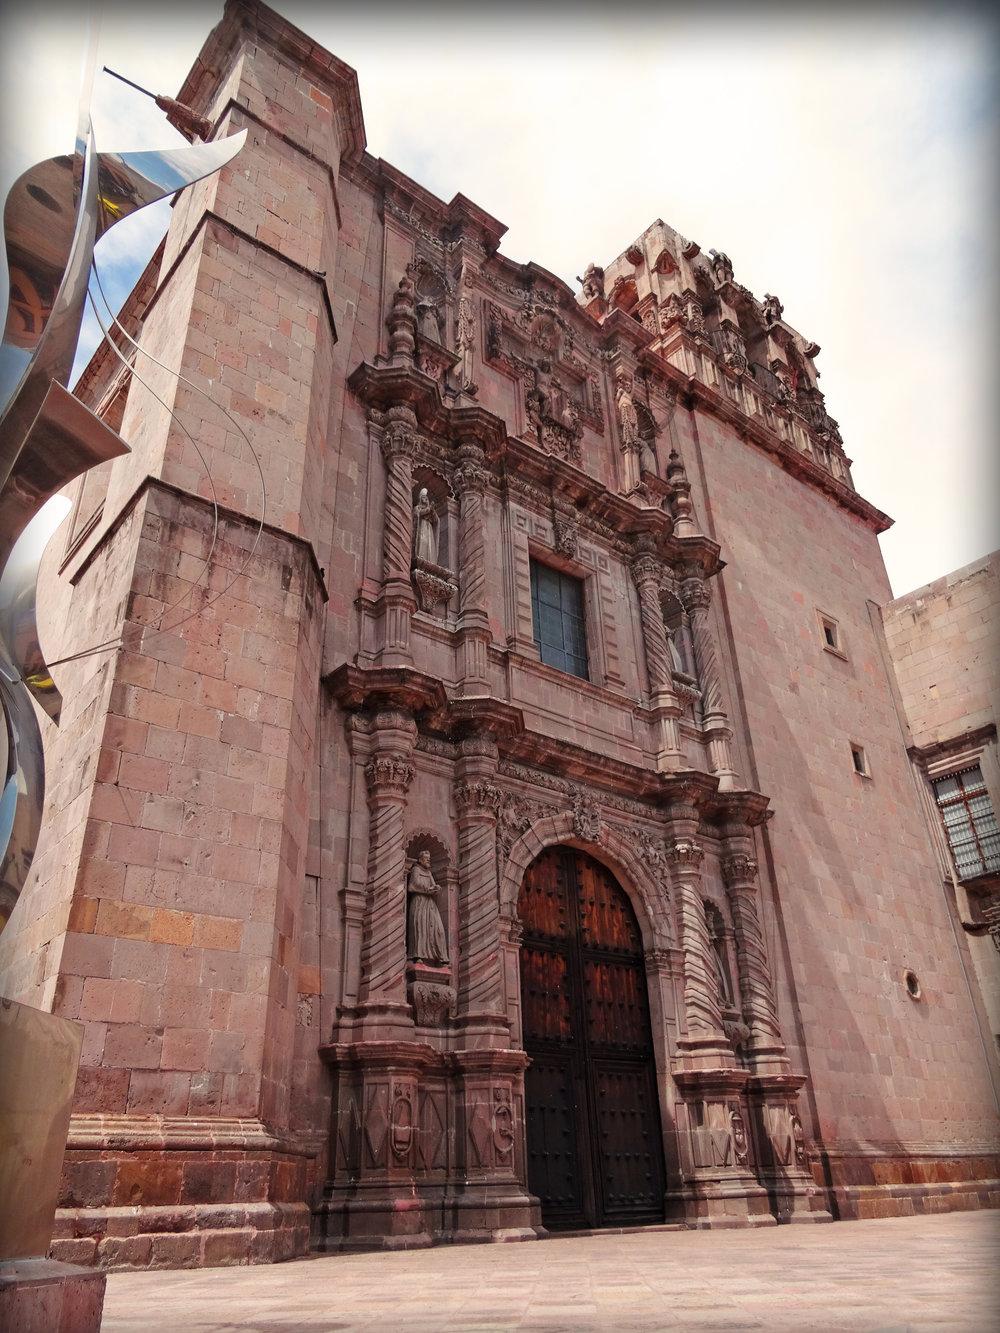 Iglesia borre a Fabysombra.jpg